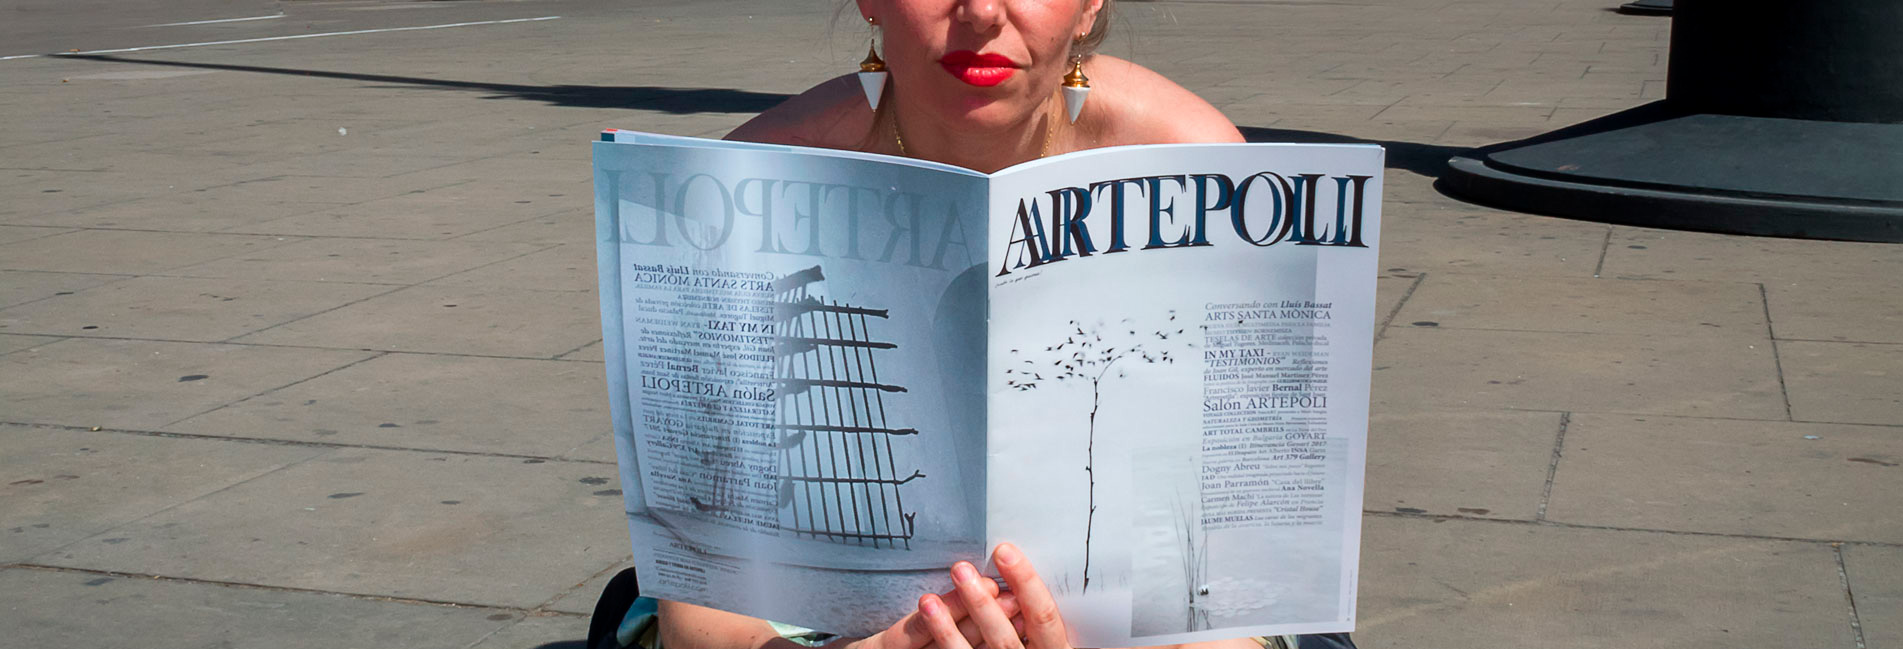 arc de triomf barcelona revista modelo